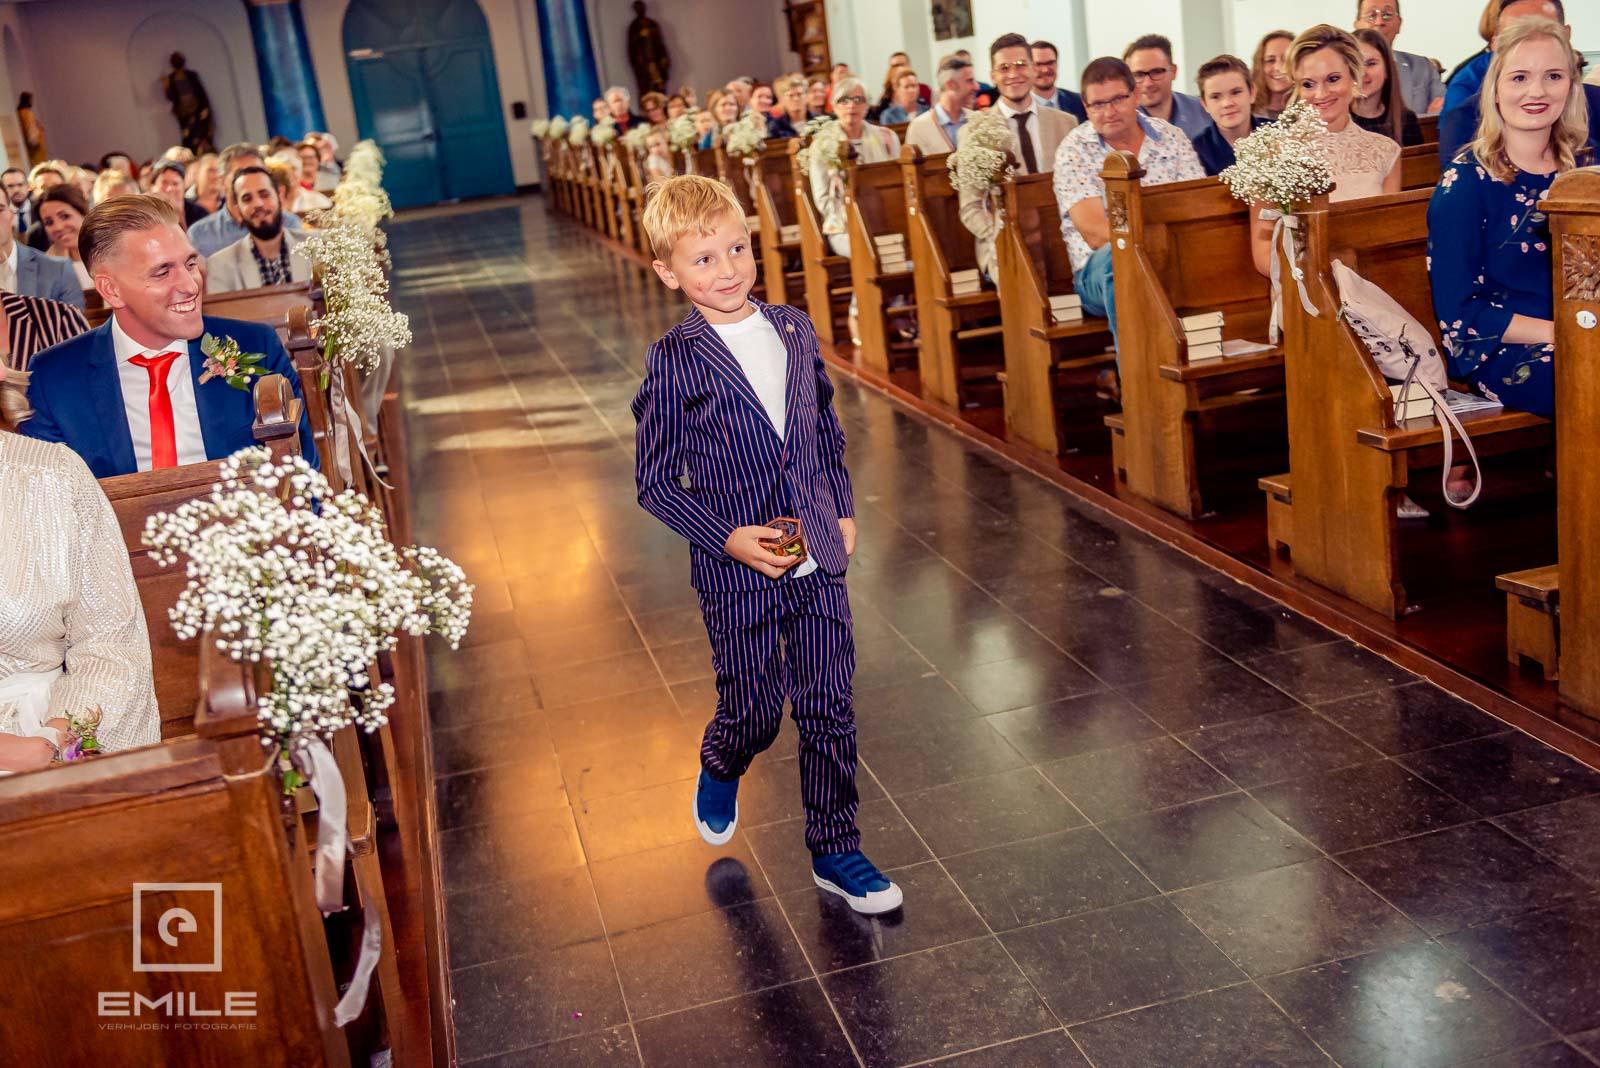 Bruidsjongen komt de ringen brengen in de kerk. Bruiloft Wylre Zuid-Limburg